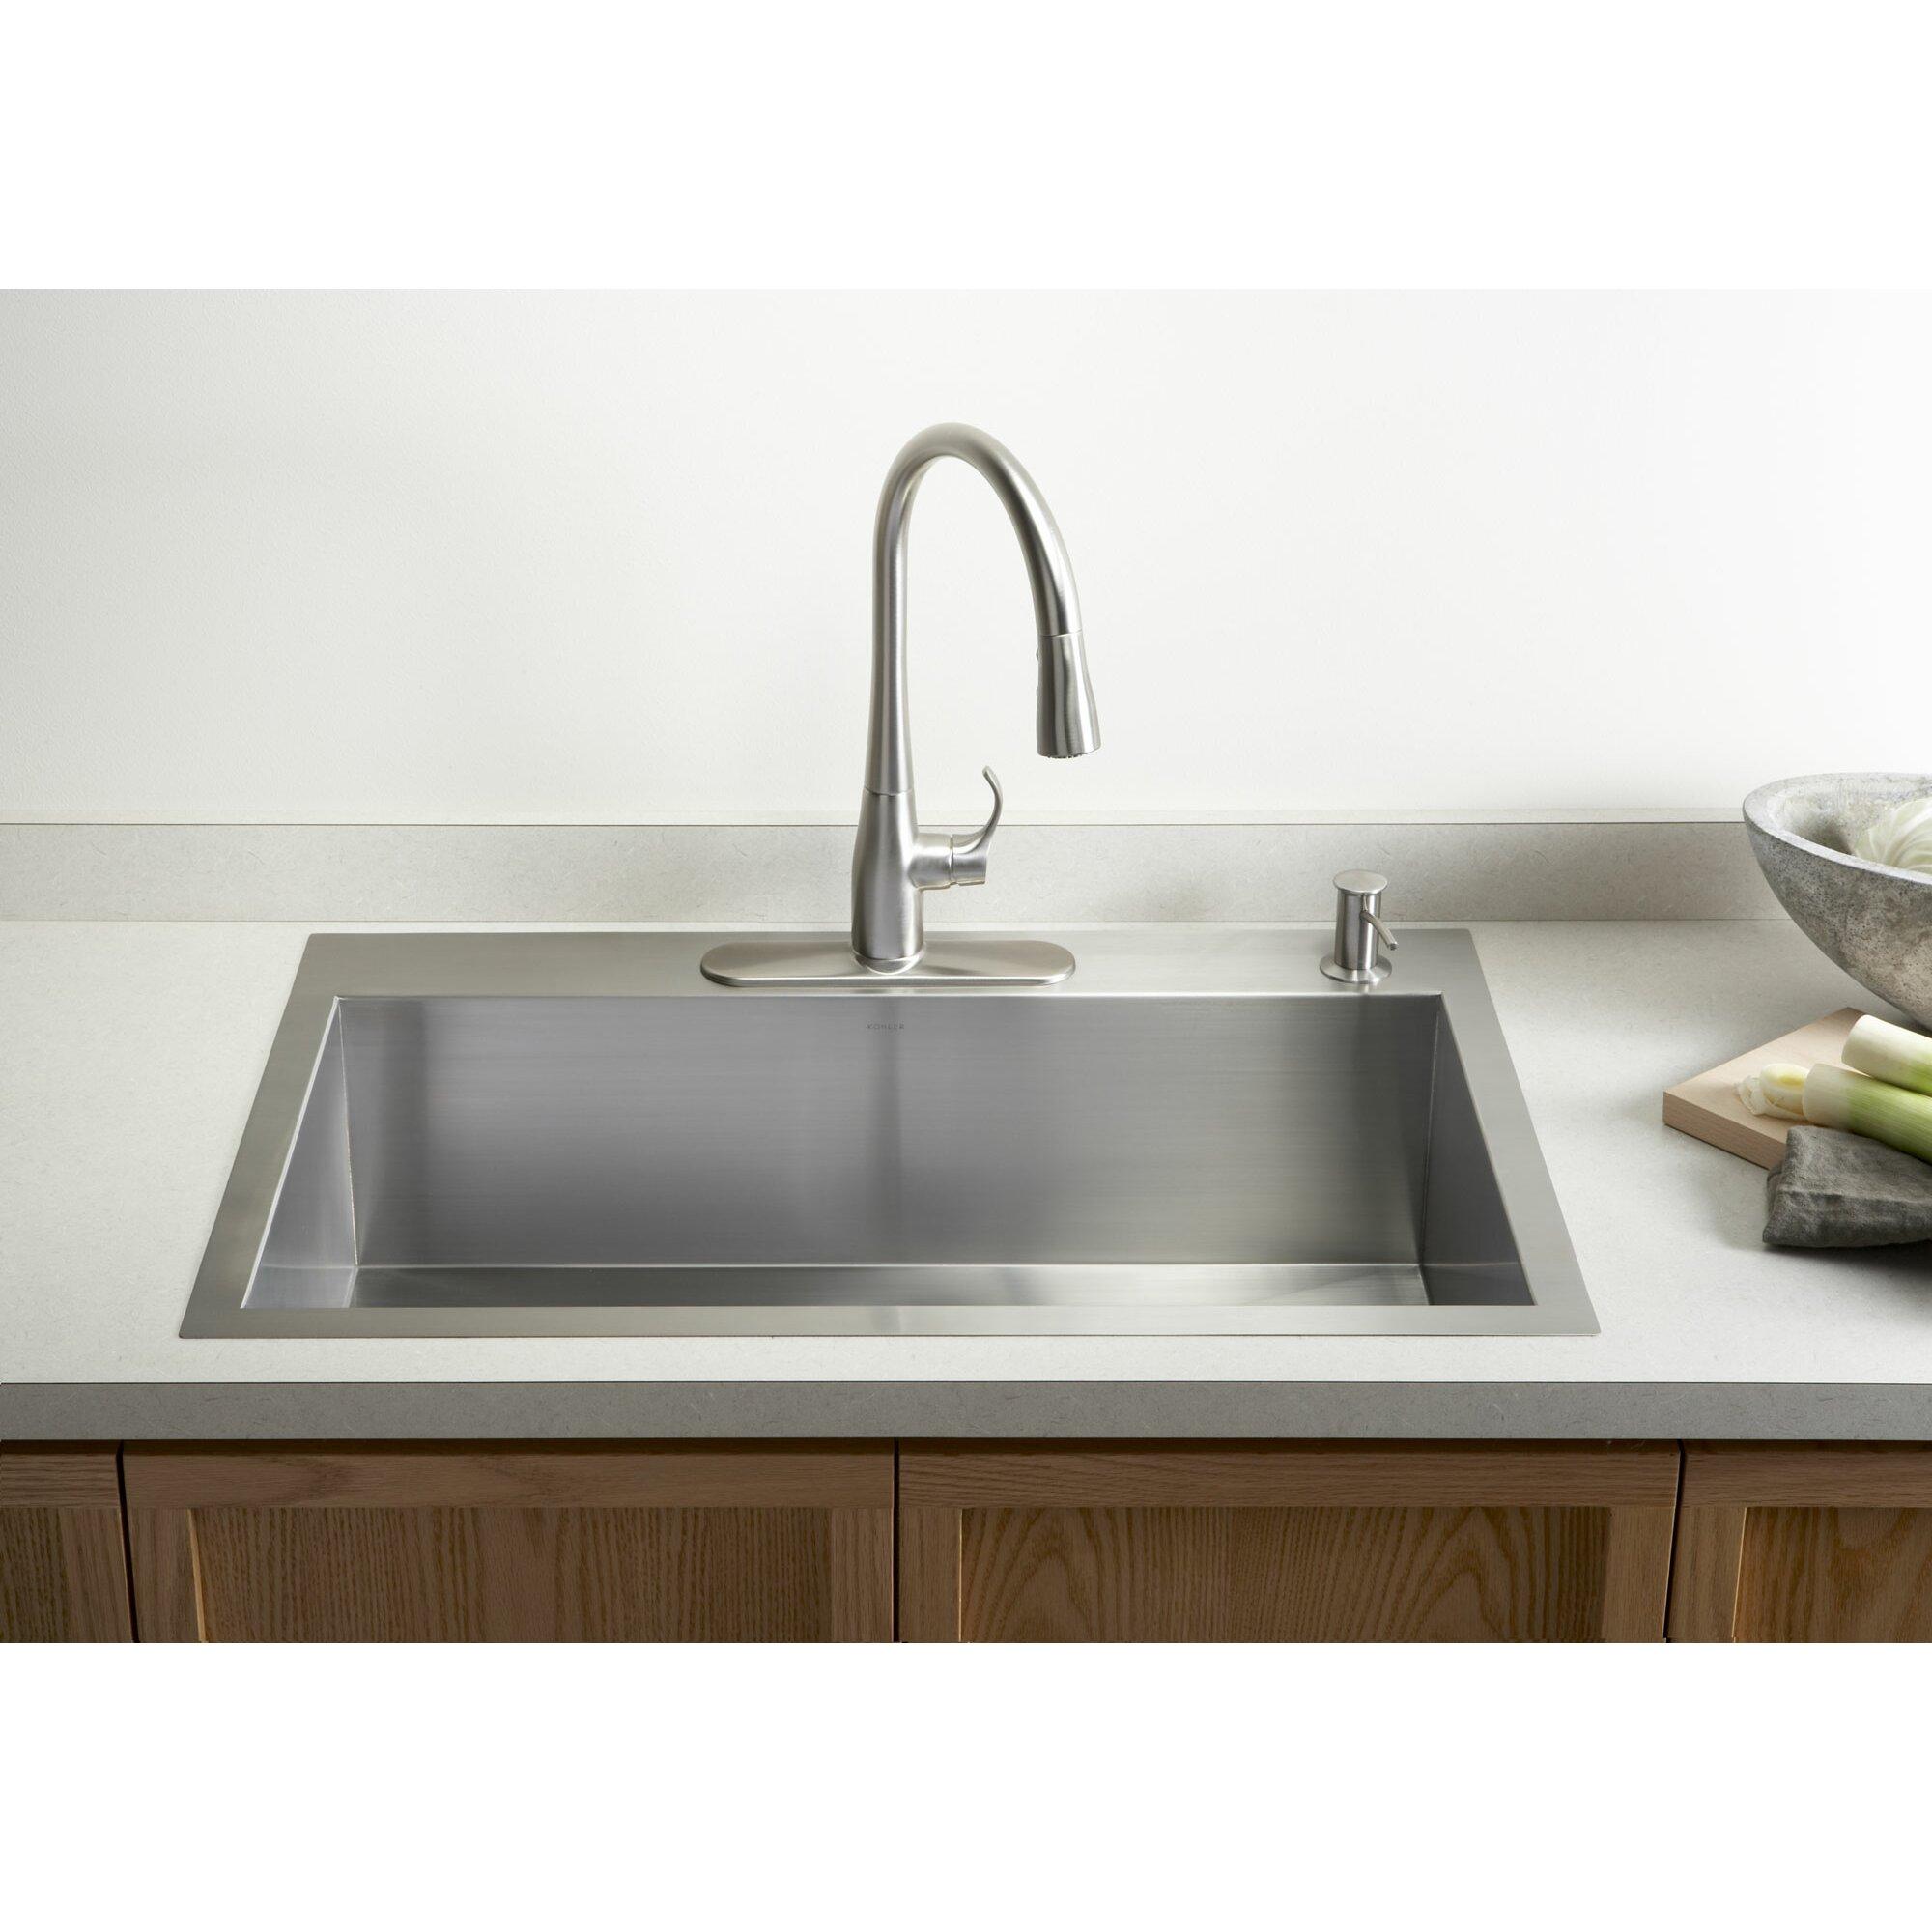 Top Mount Farmhouse Sink White : ... Stainless Steel Kitchen Sinks 7 Sinks Top Mount Photos House. Yive.co